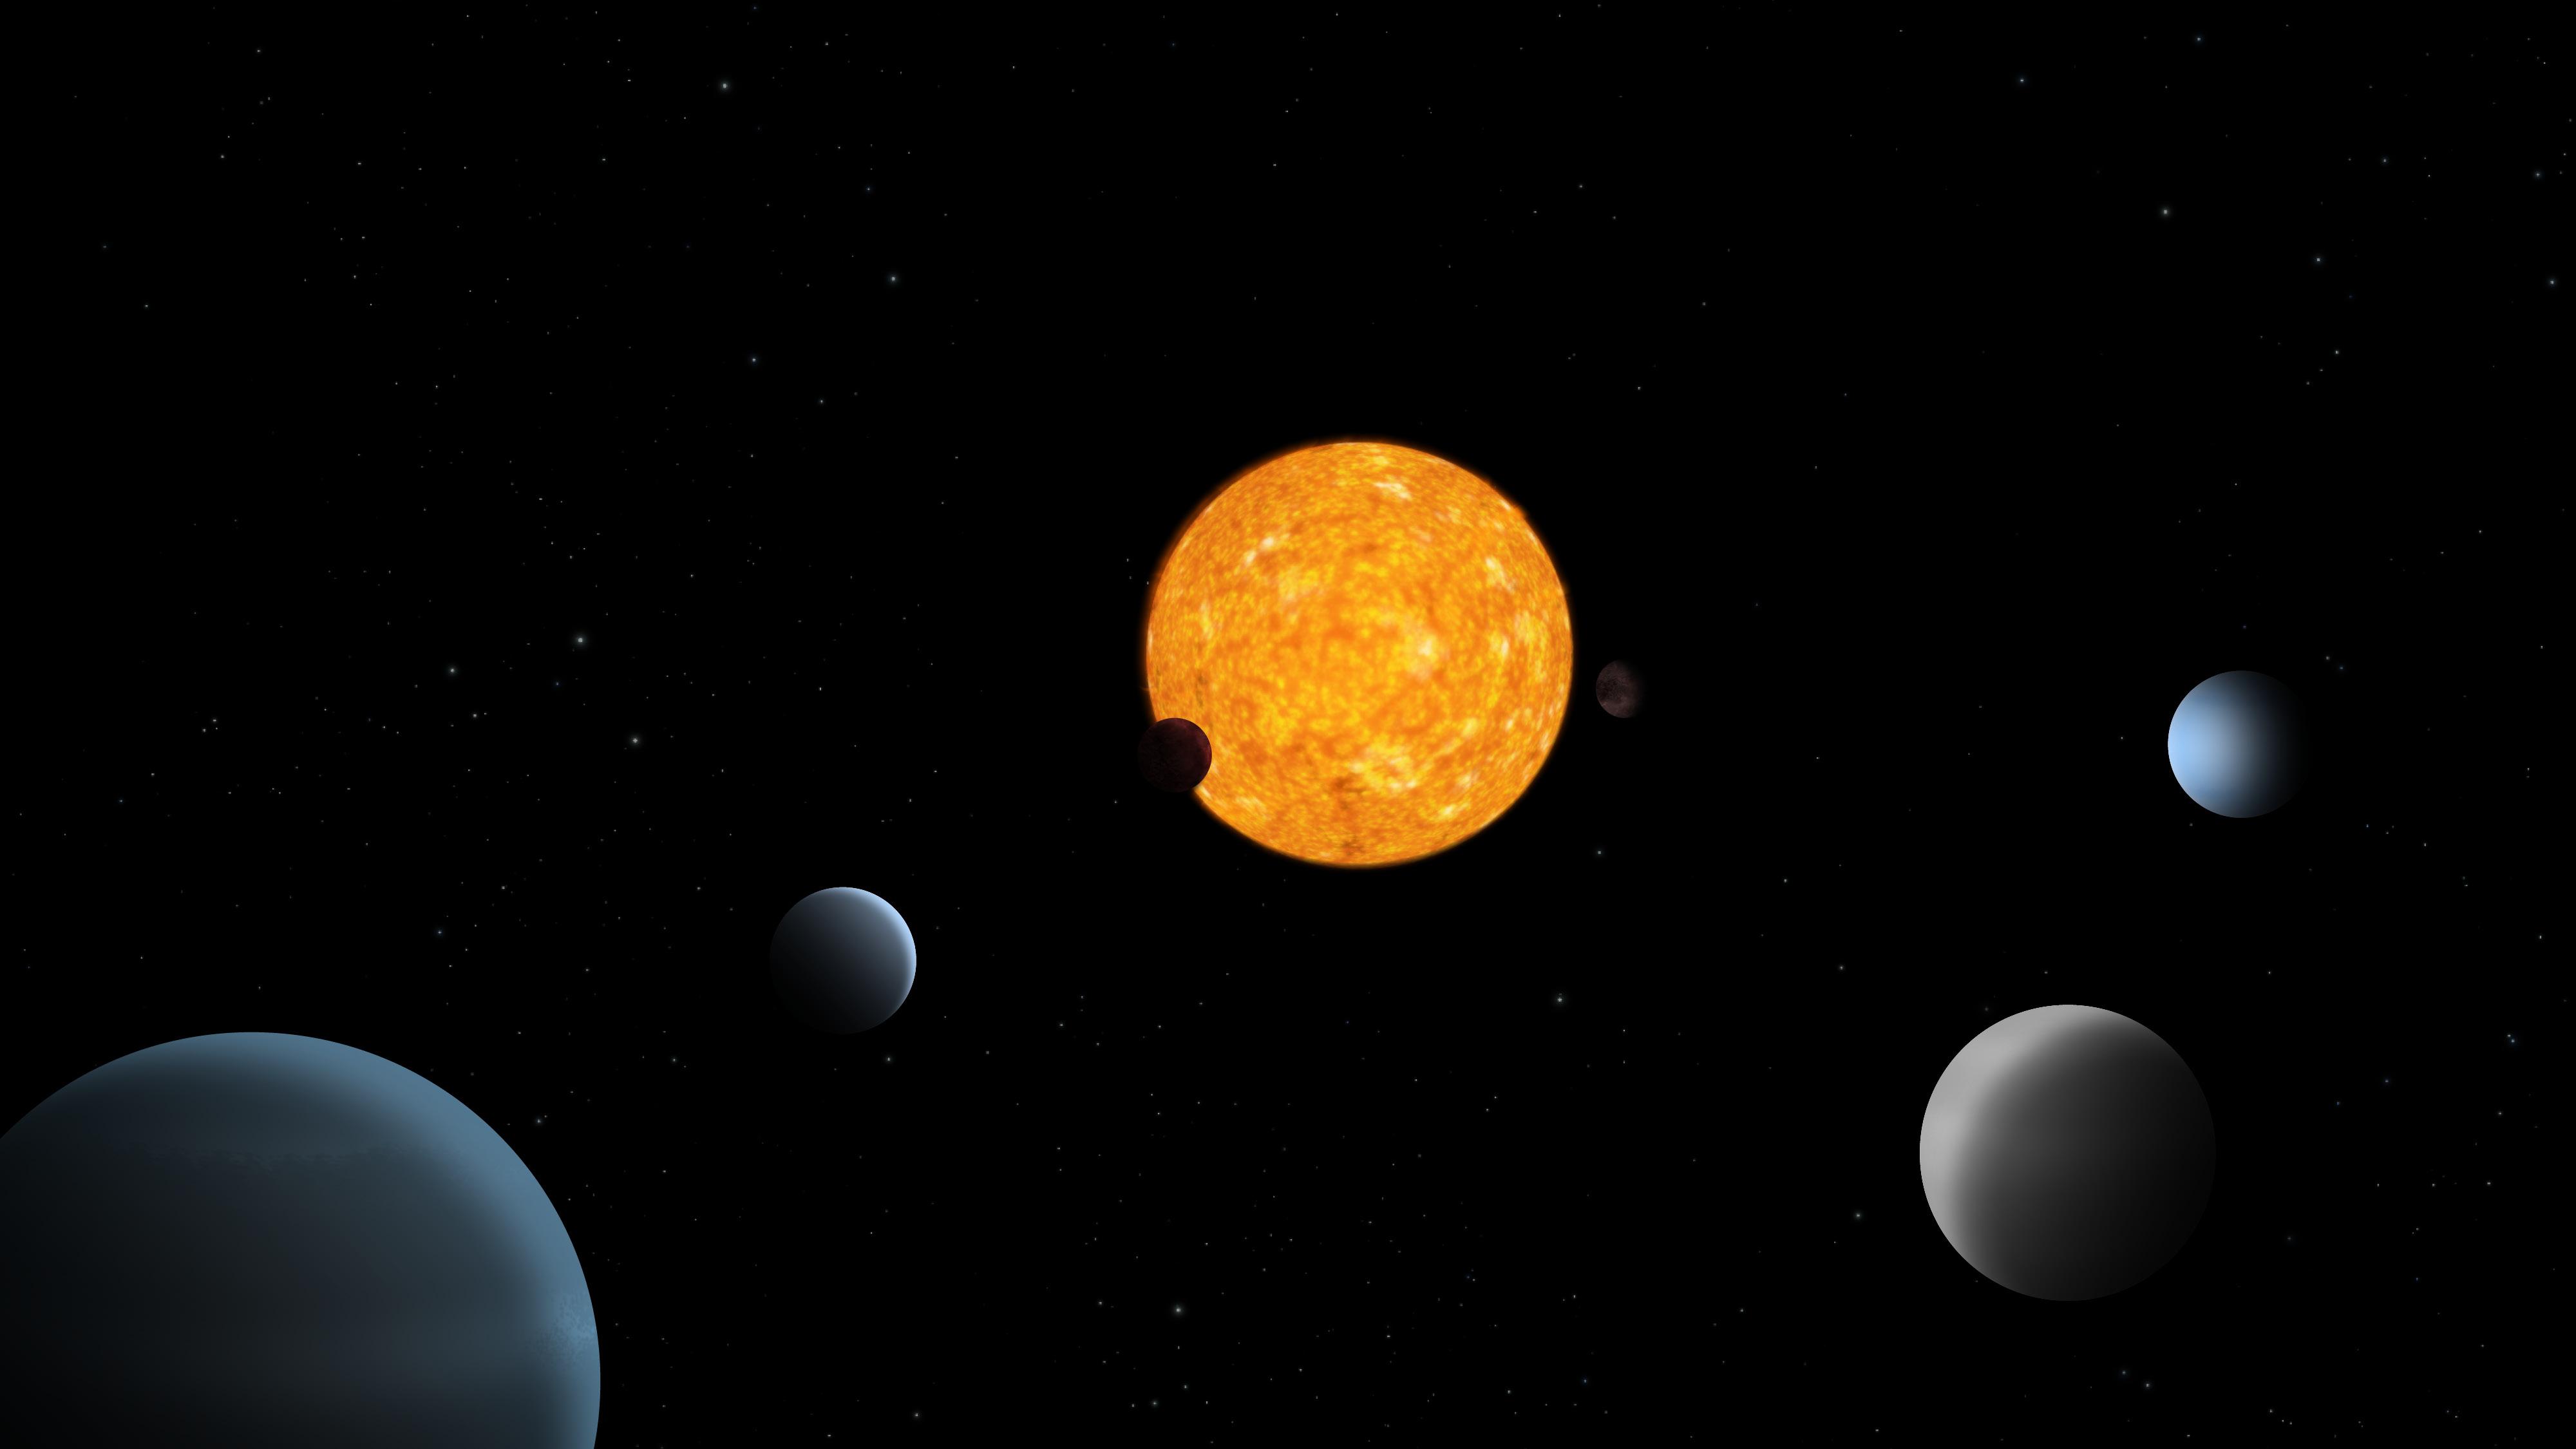 Planetsystem